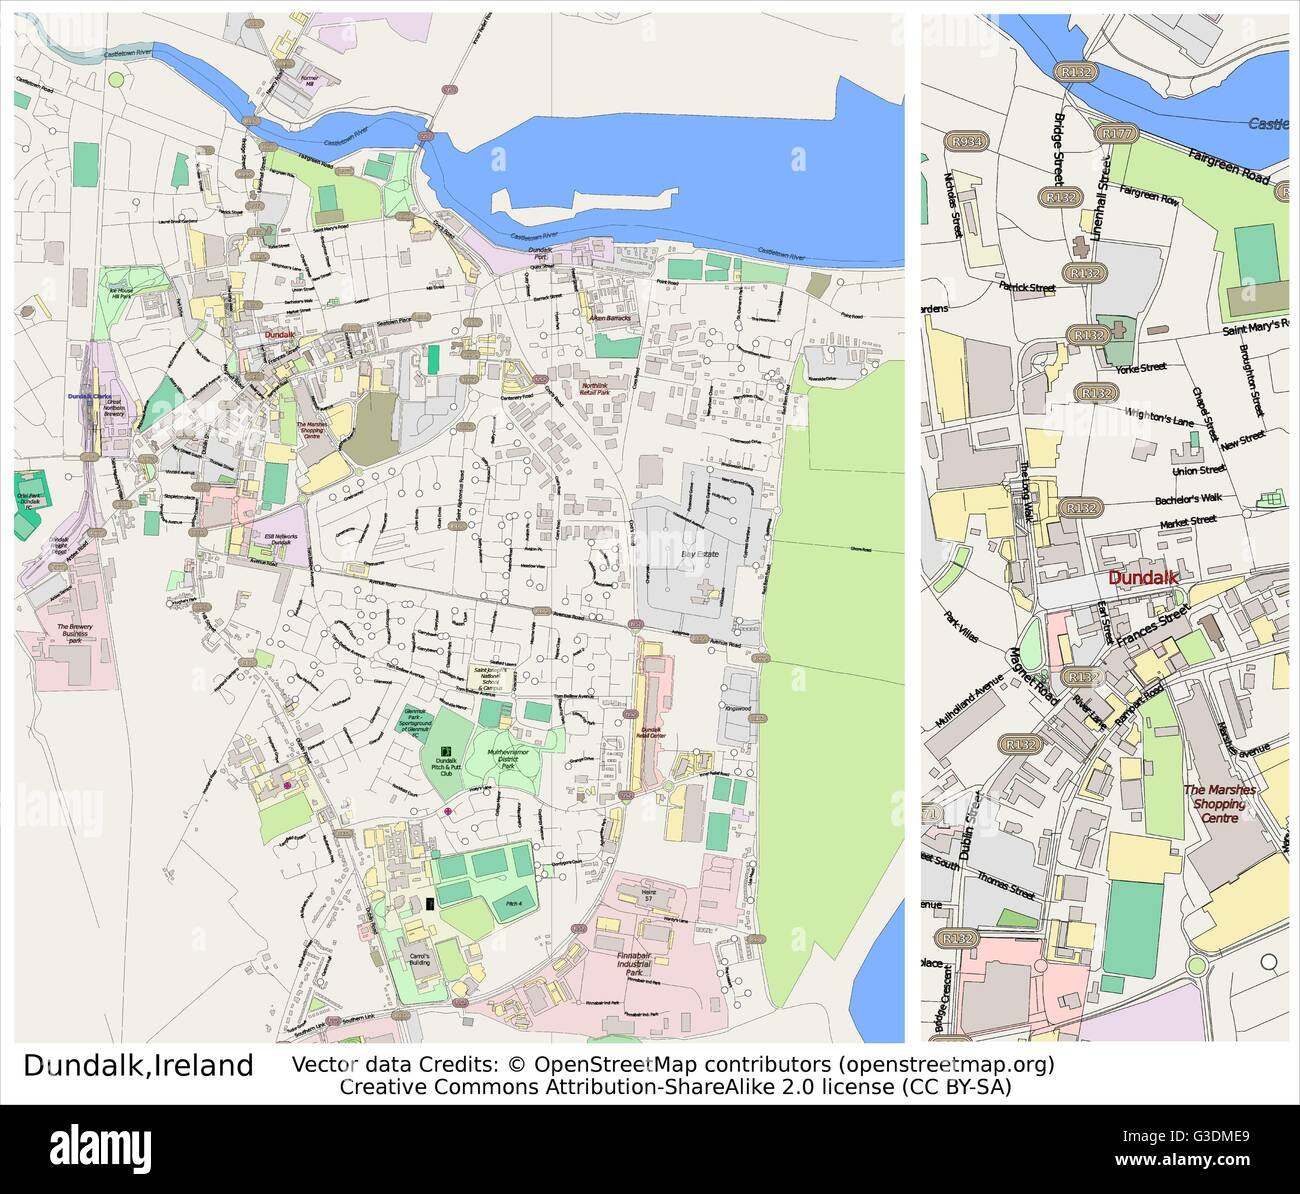 Dundalk Map Of Ireland.Dundalk Ireland City Map Stock Vector Art Illustration Vector